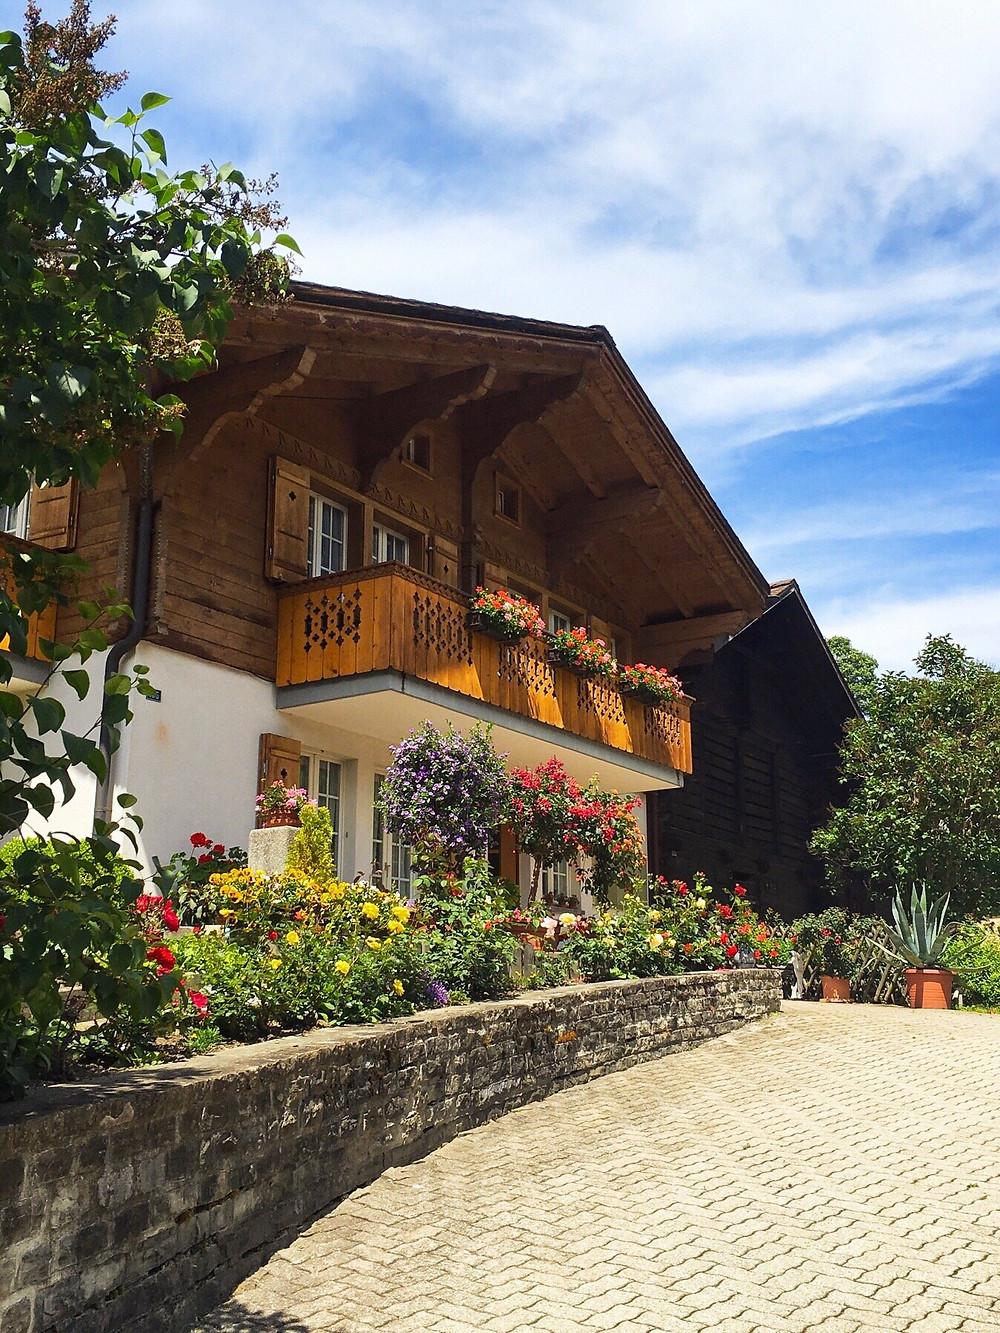 Swiss chalet in Grindelwald